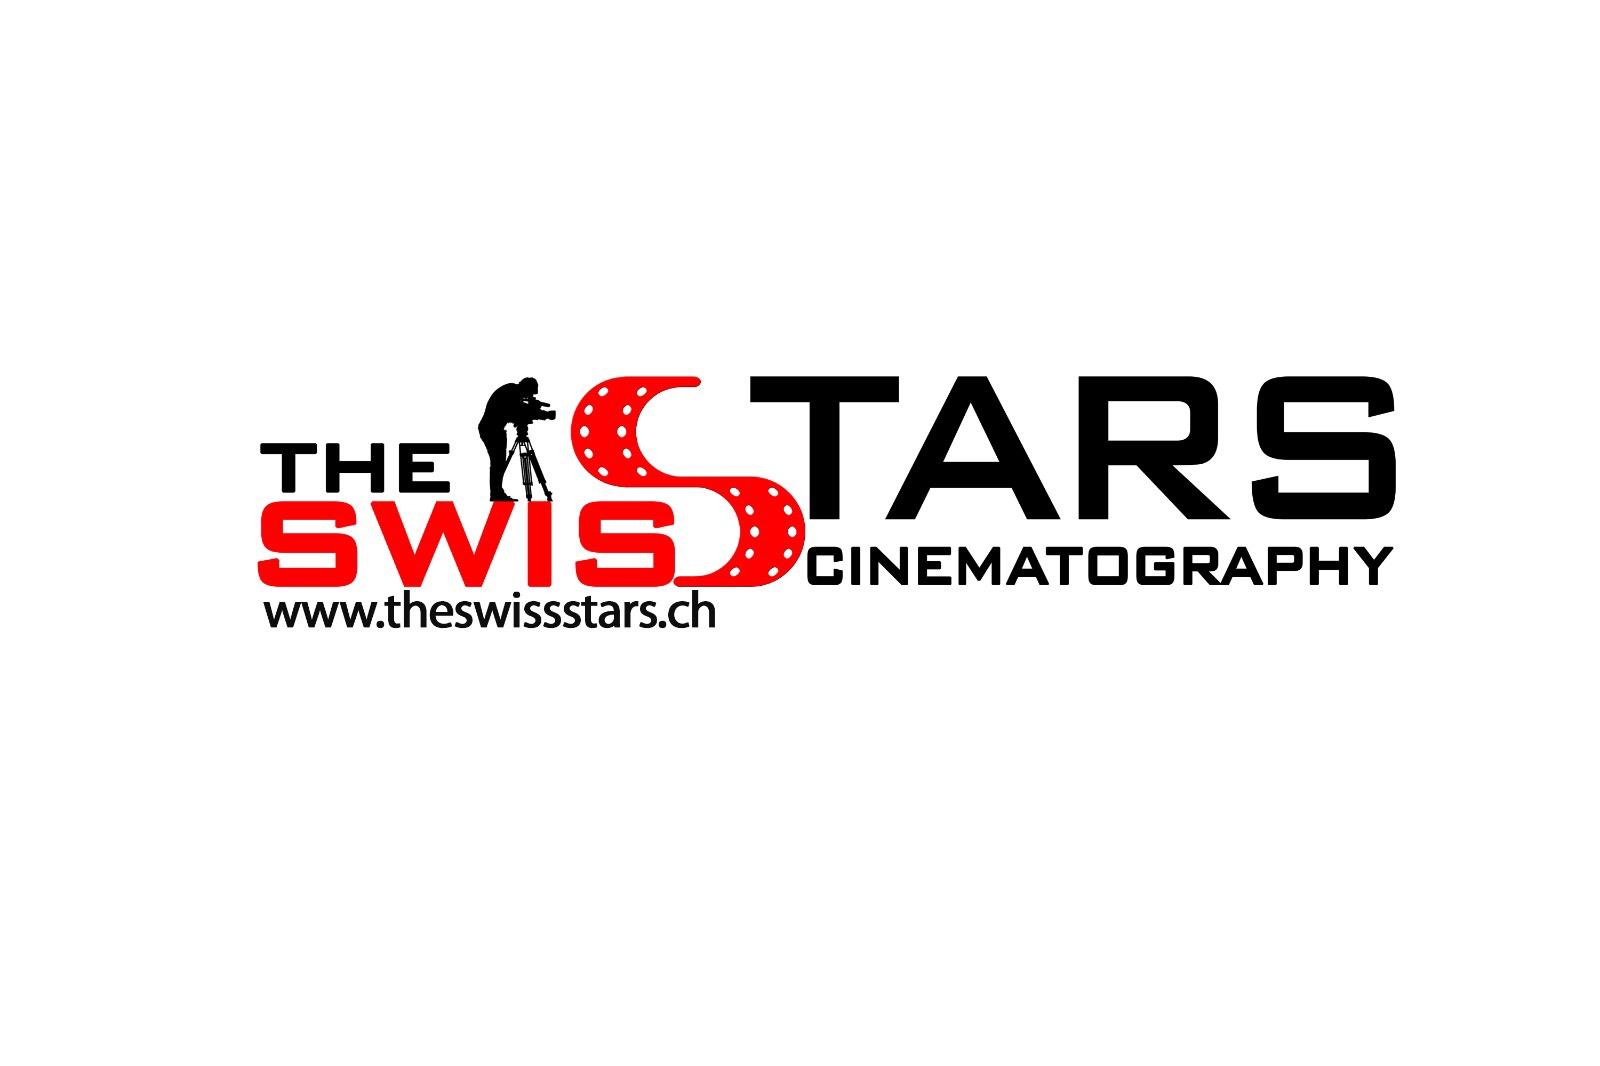 The swiss stars